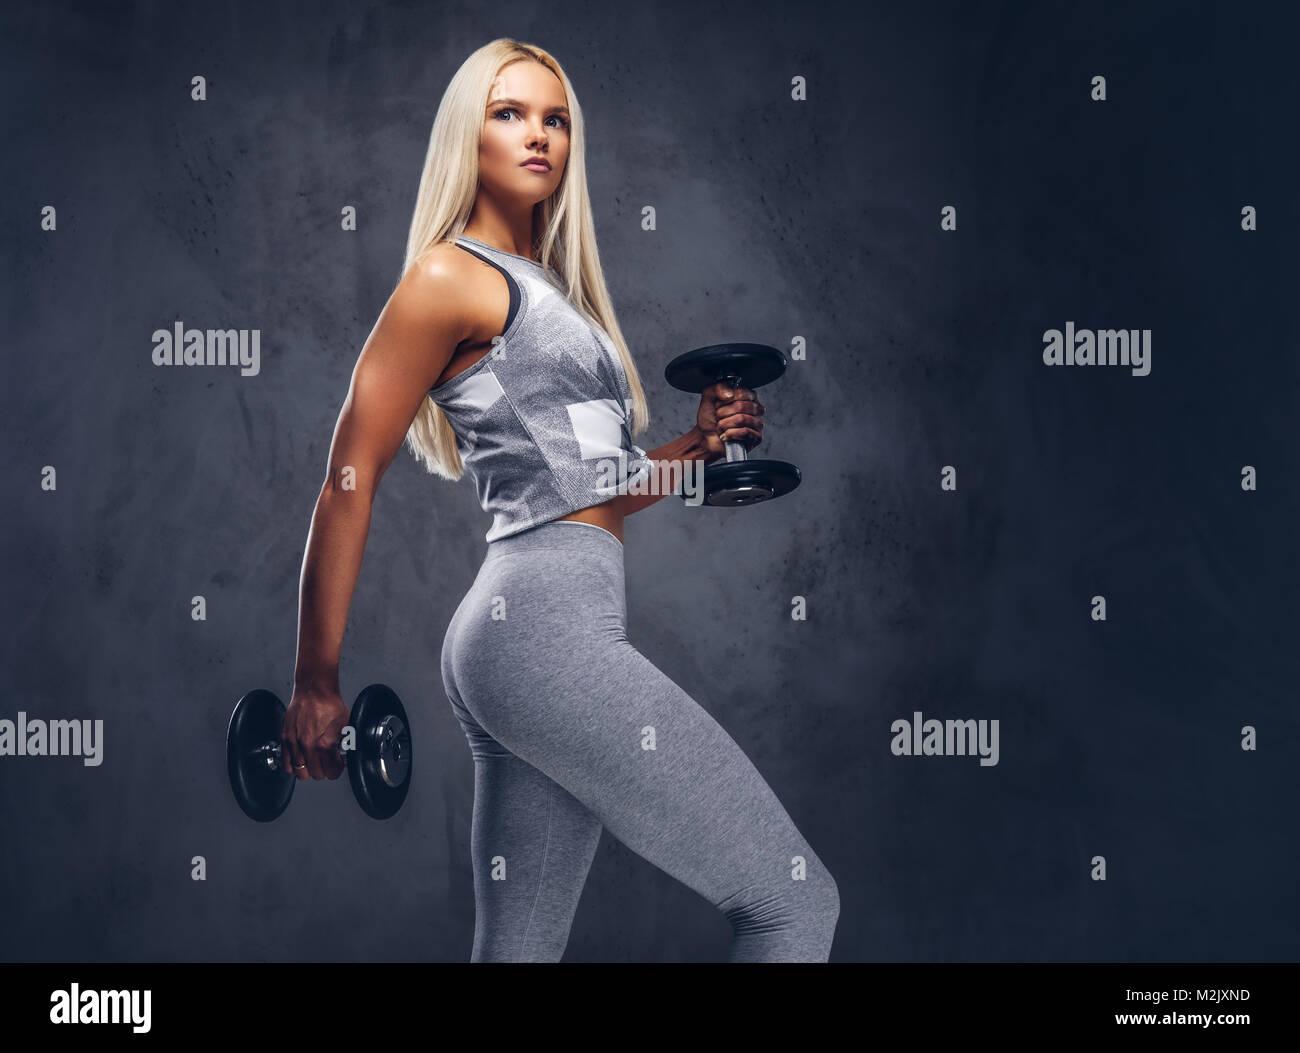 Studio portrait of a sporty woman. - Stock Image